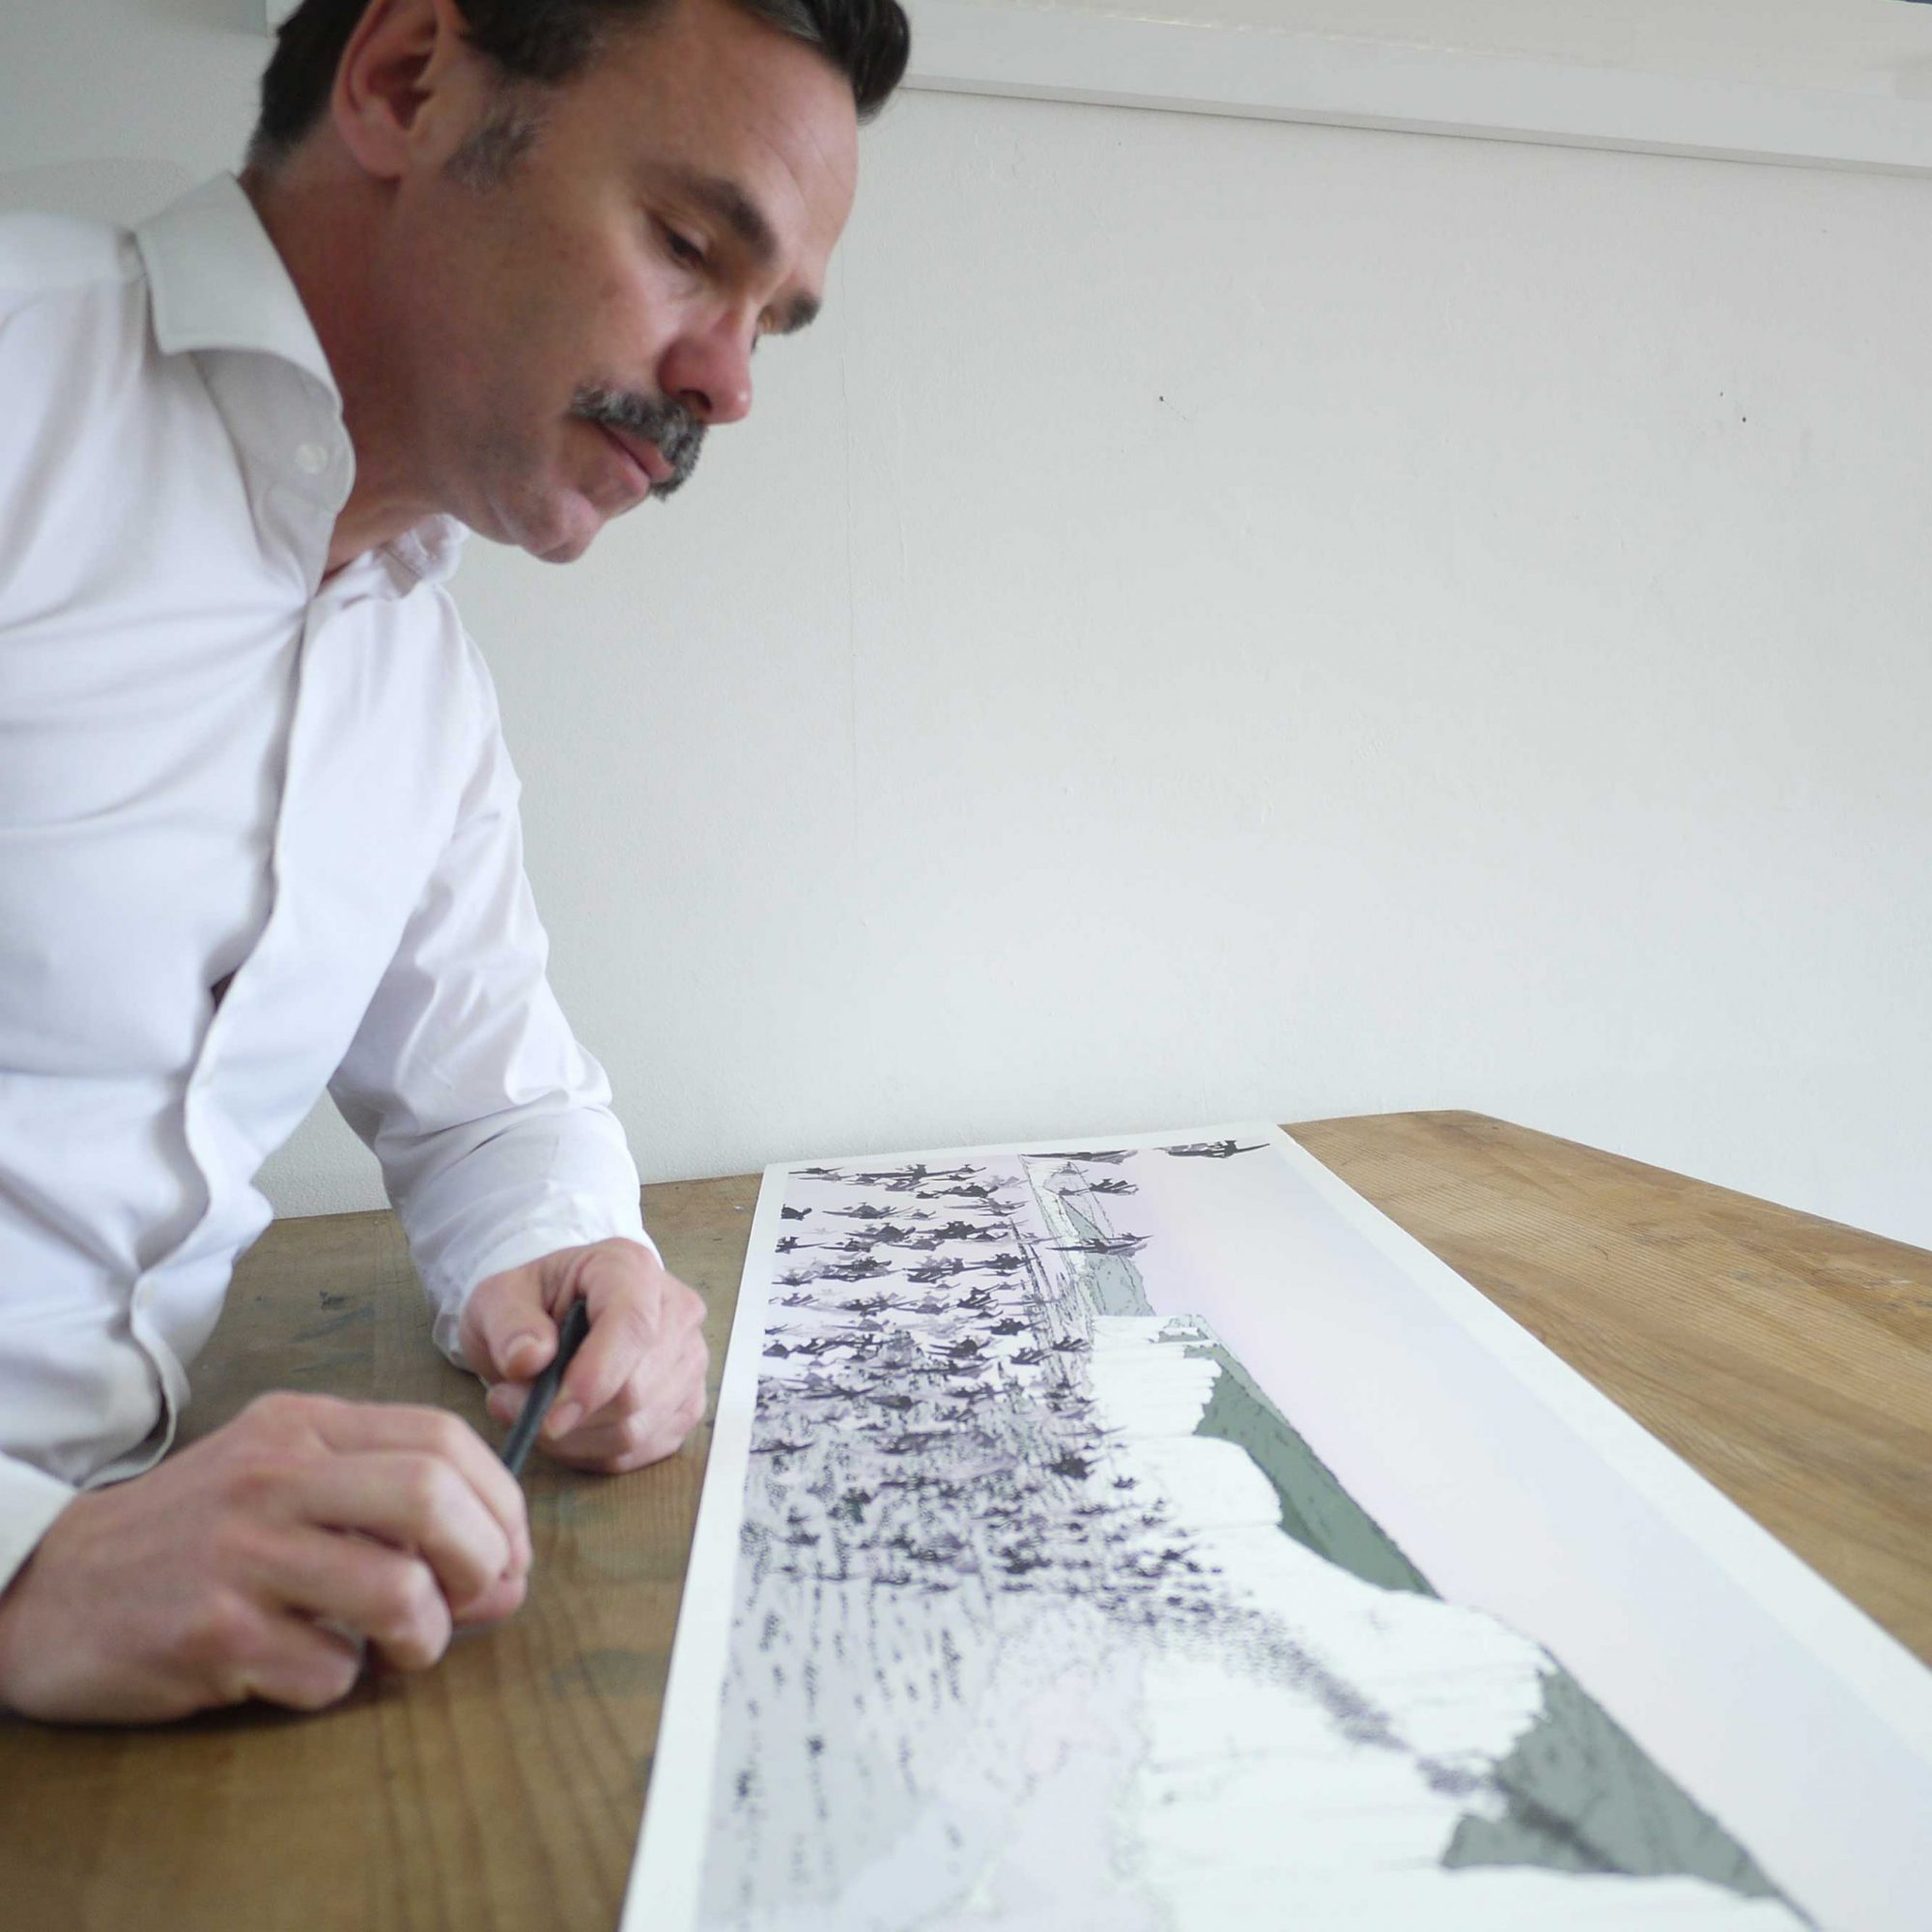 inspection of panoramic print named Birling Gap Starling Murmuration Eventide by artist alej ez